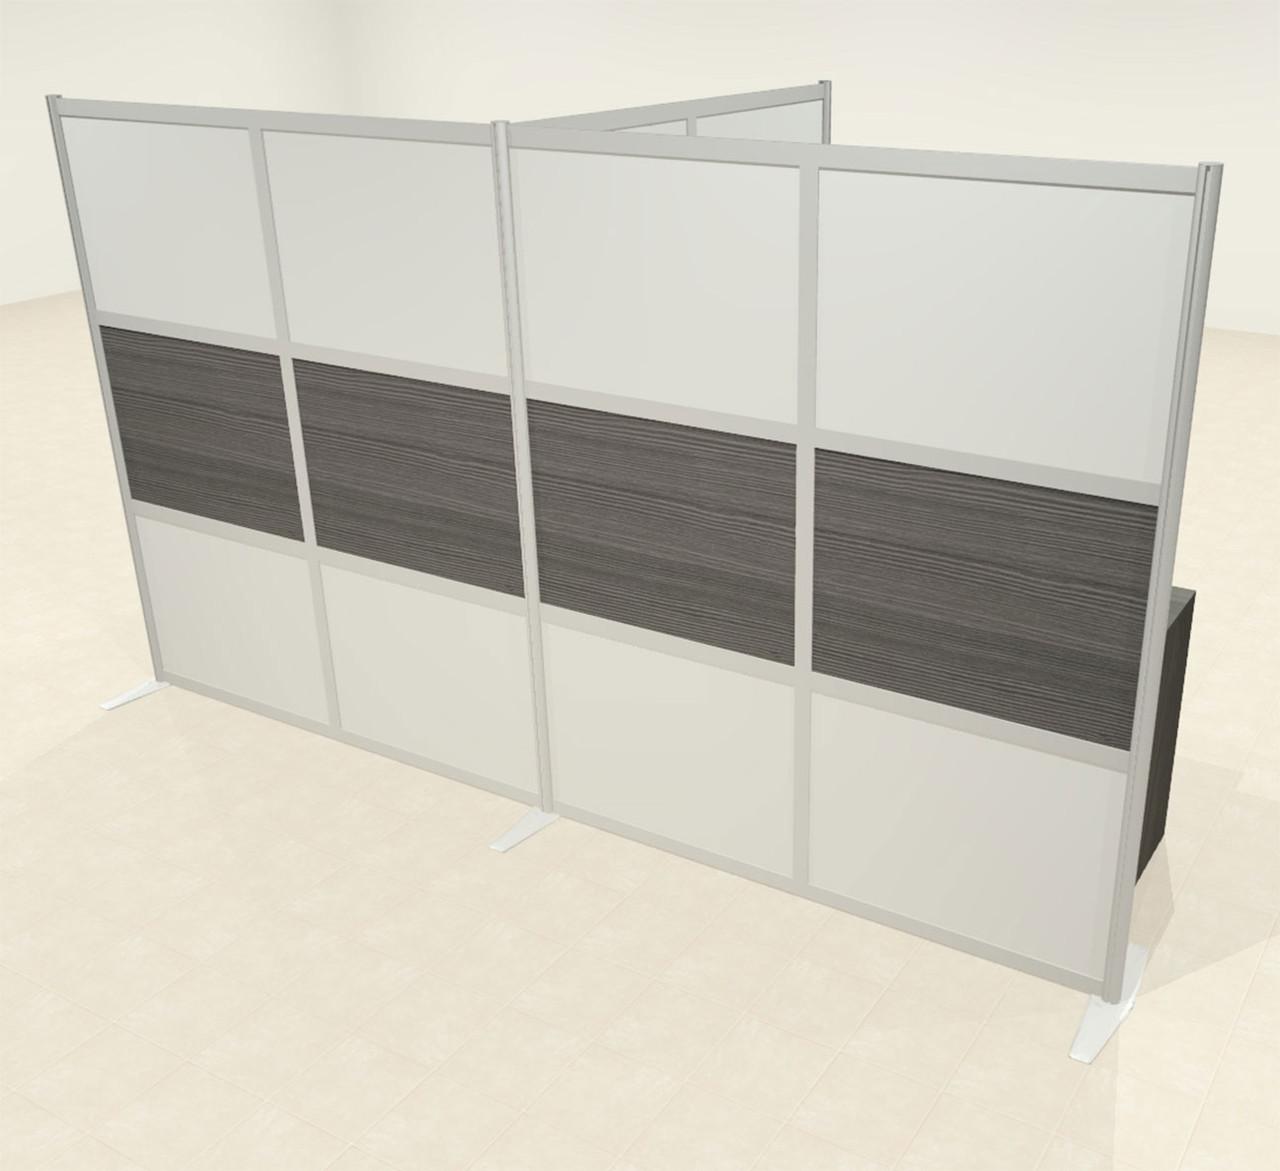 One T Shaped Loft Modern Office Home Aluminum Frame Partition / Divider / Sneeze Guard, #UT-ALU-P67-B